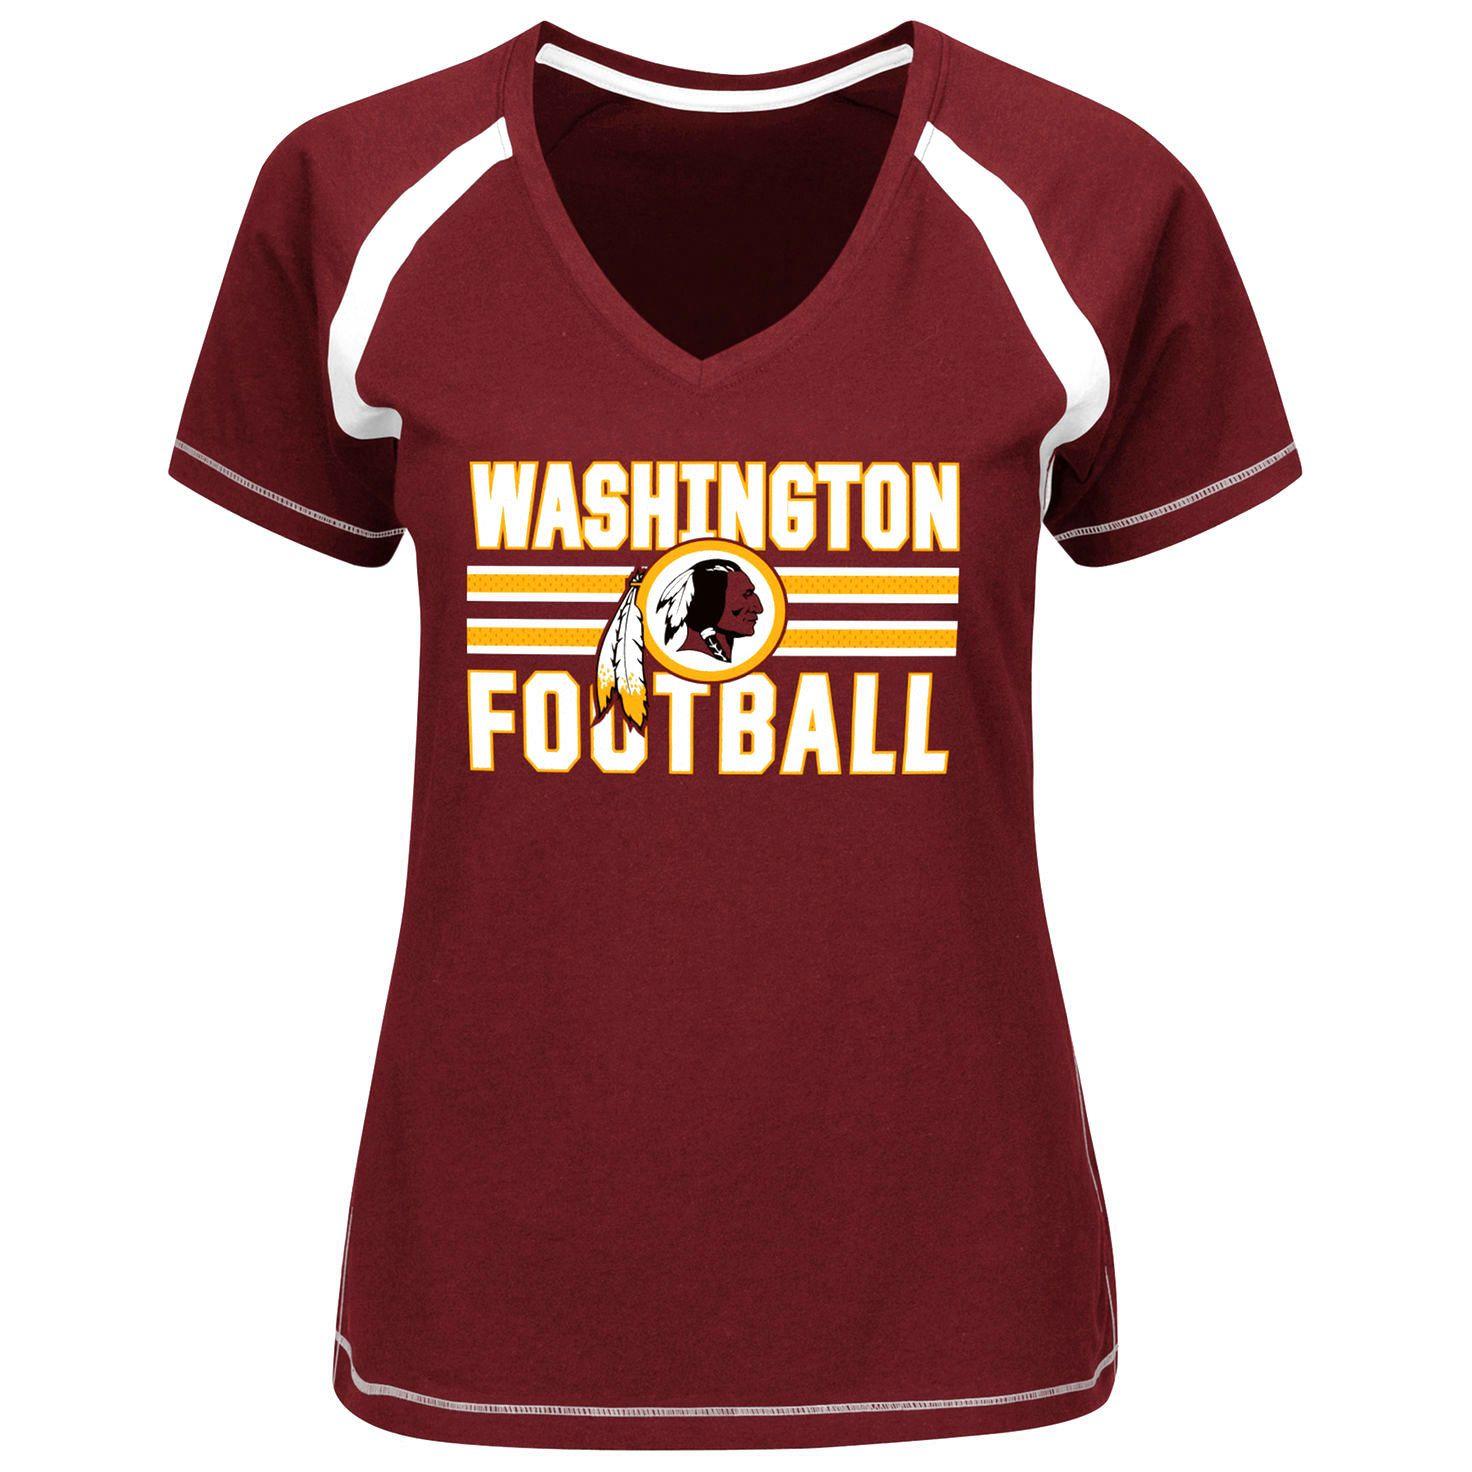 Washington Redskins Majestic Womens Plus Sizes Game Day V-Neck T-Shirt -  Burgundy f5376a658